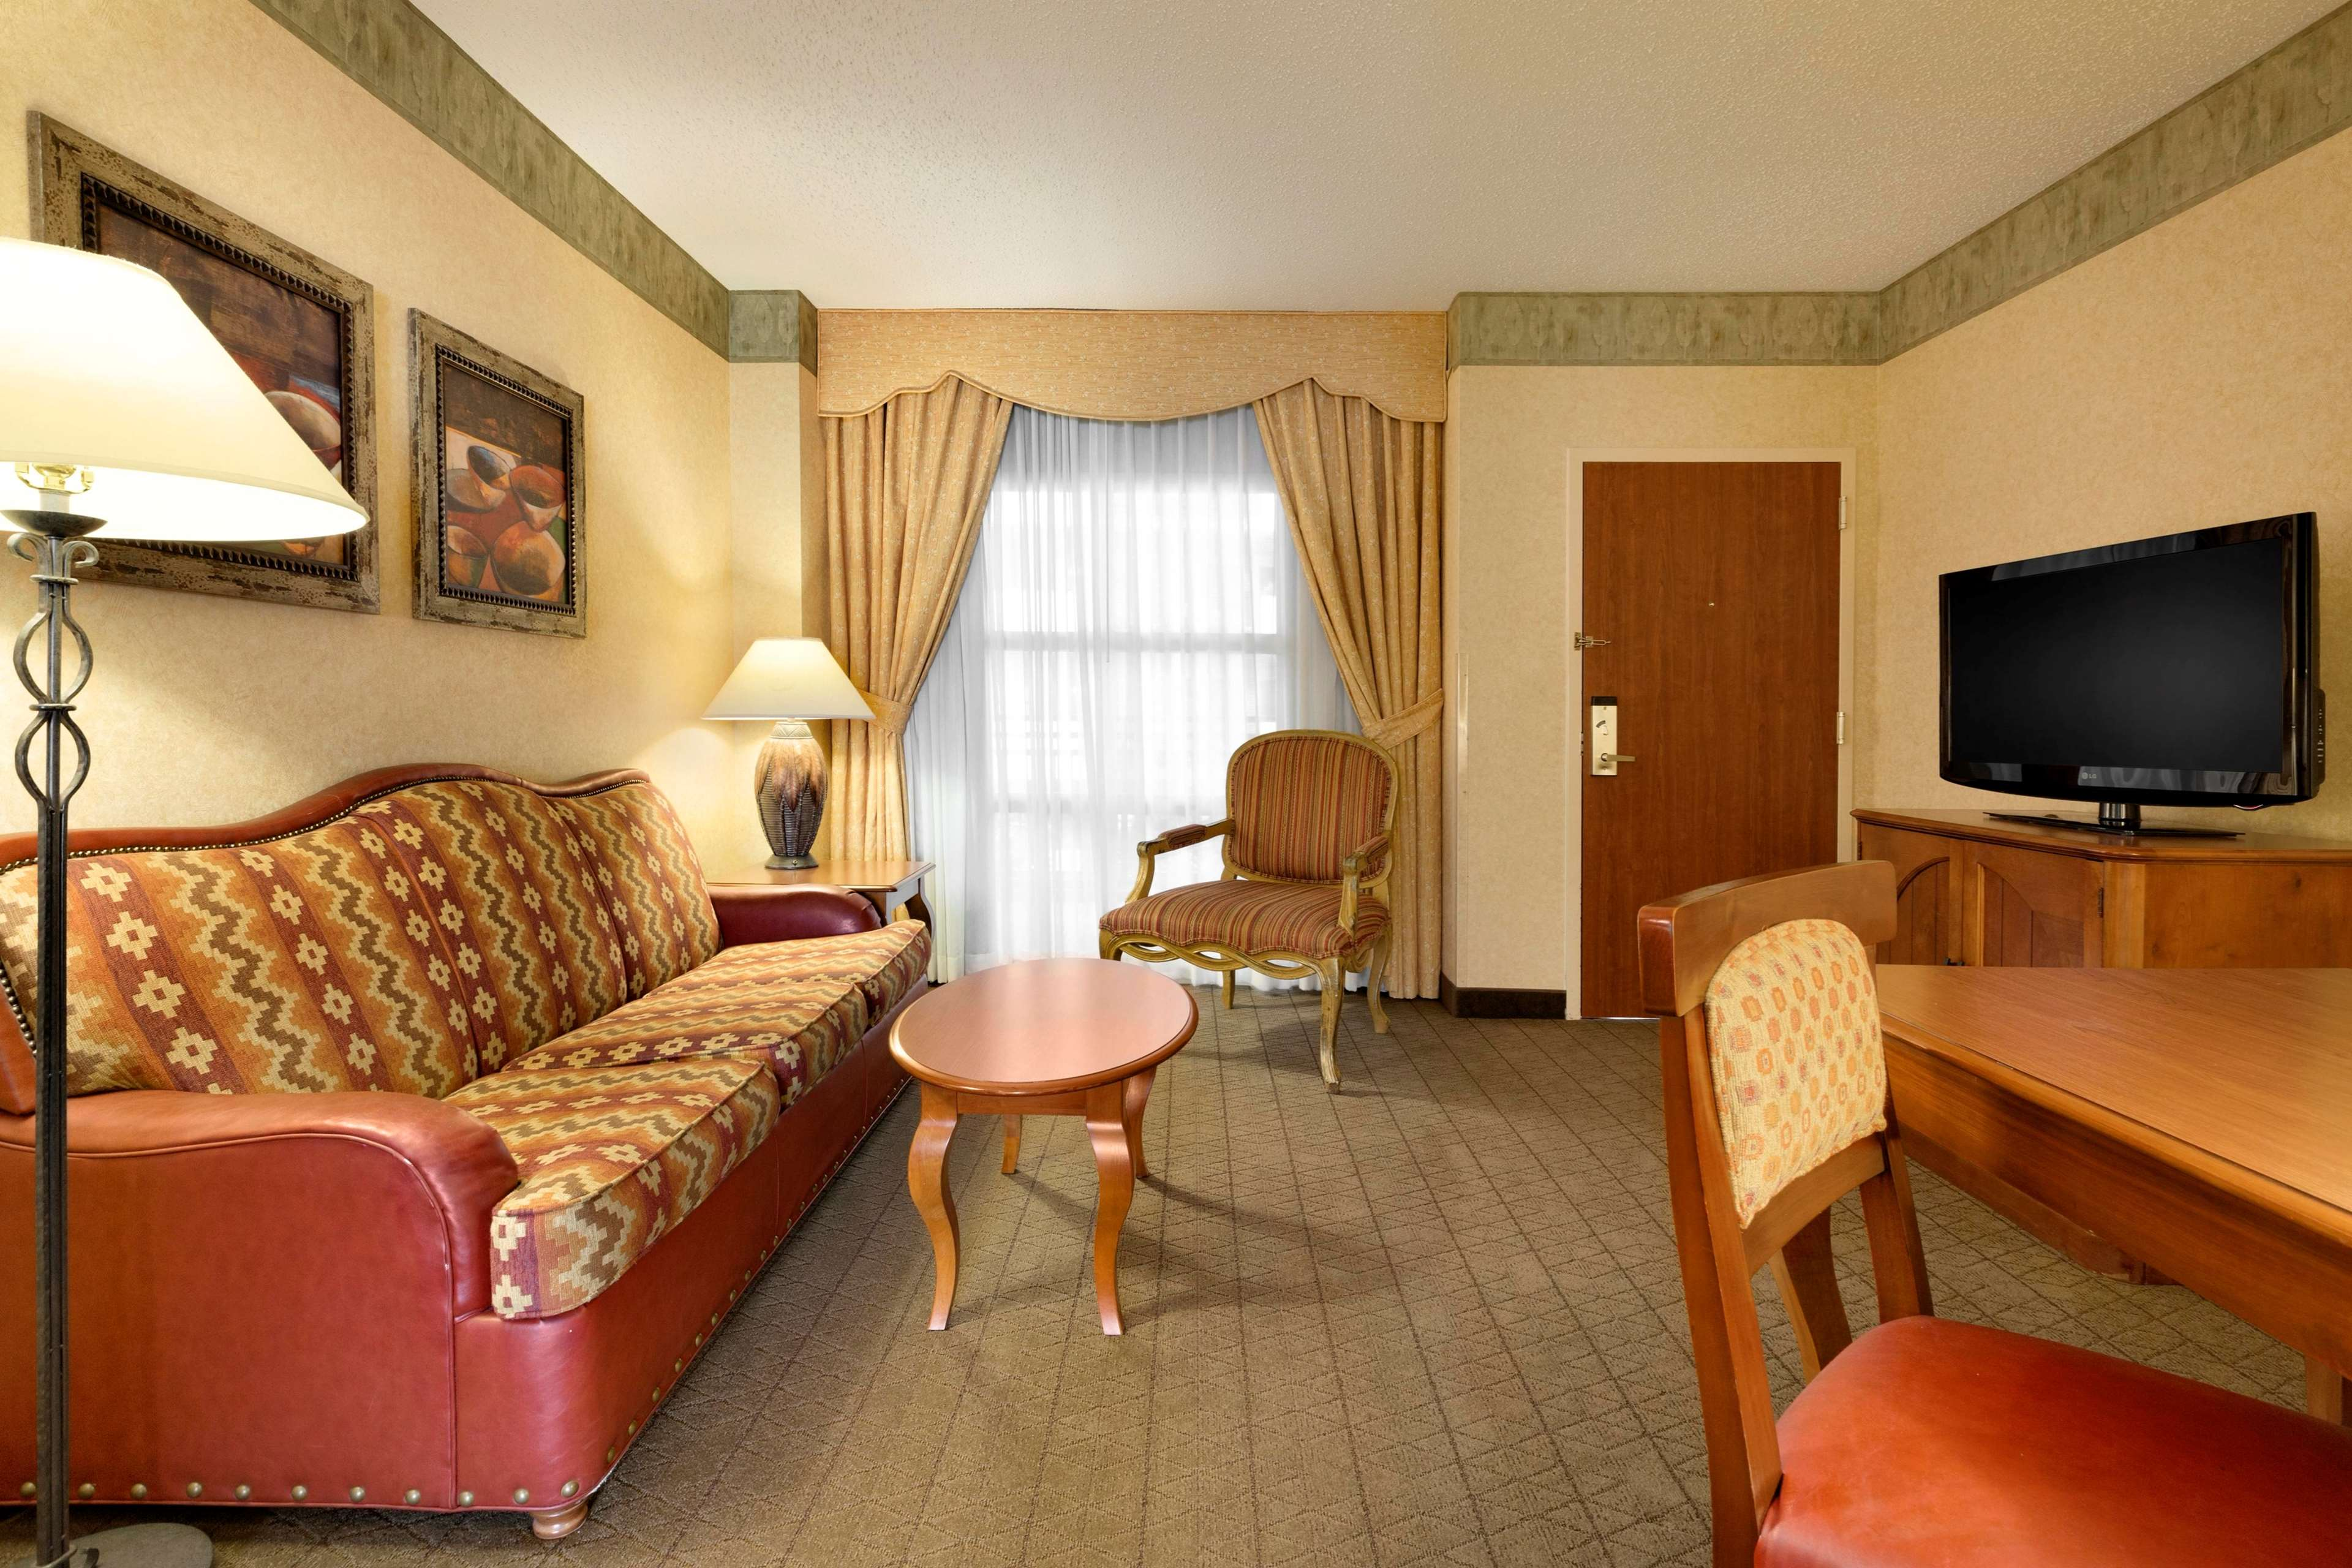 Embassy Suites by Hilton Albuquerque Hotel & Spa image 13